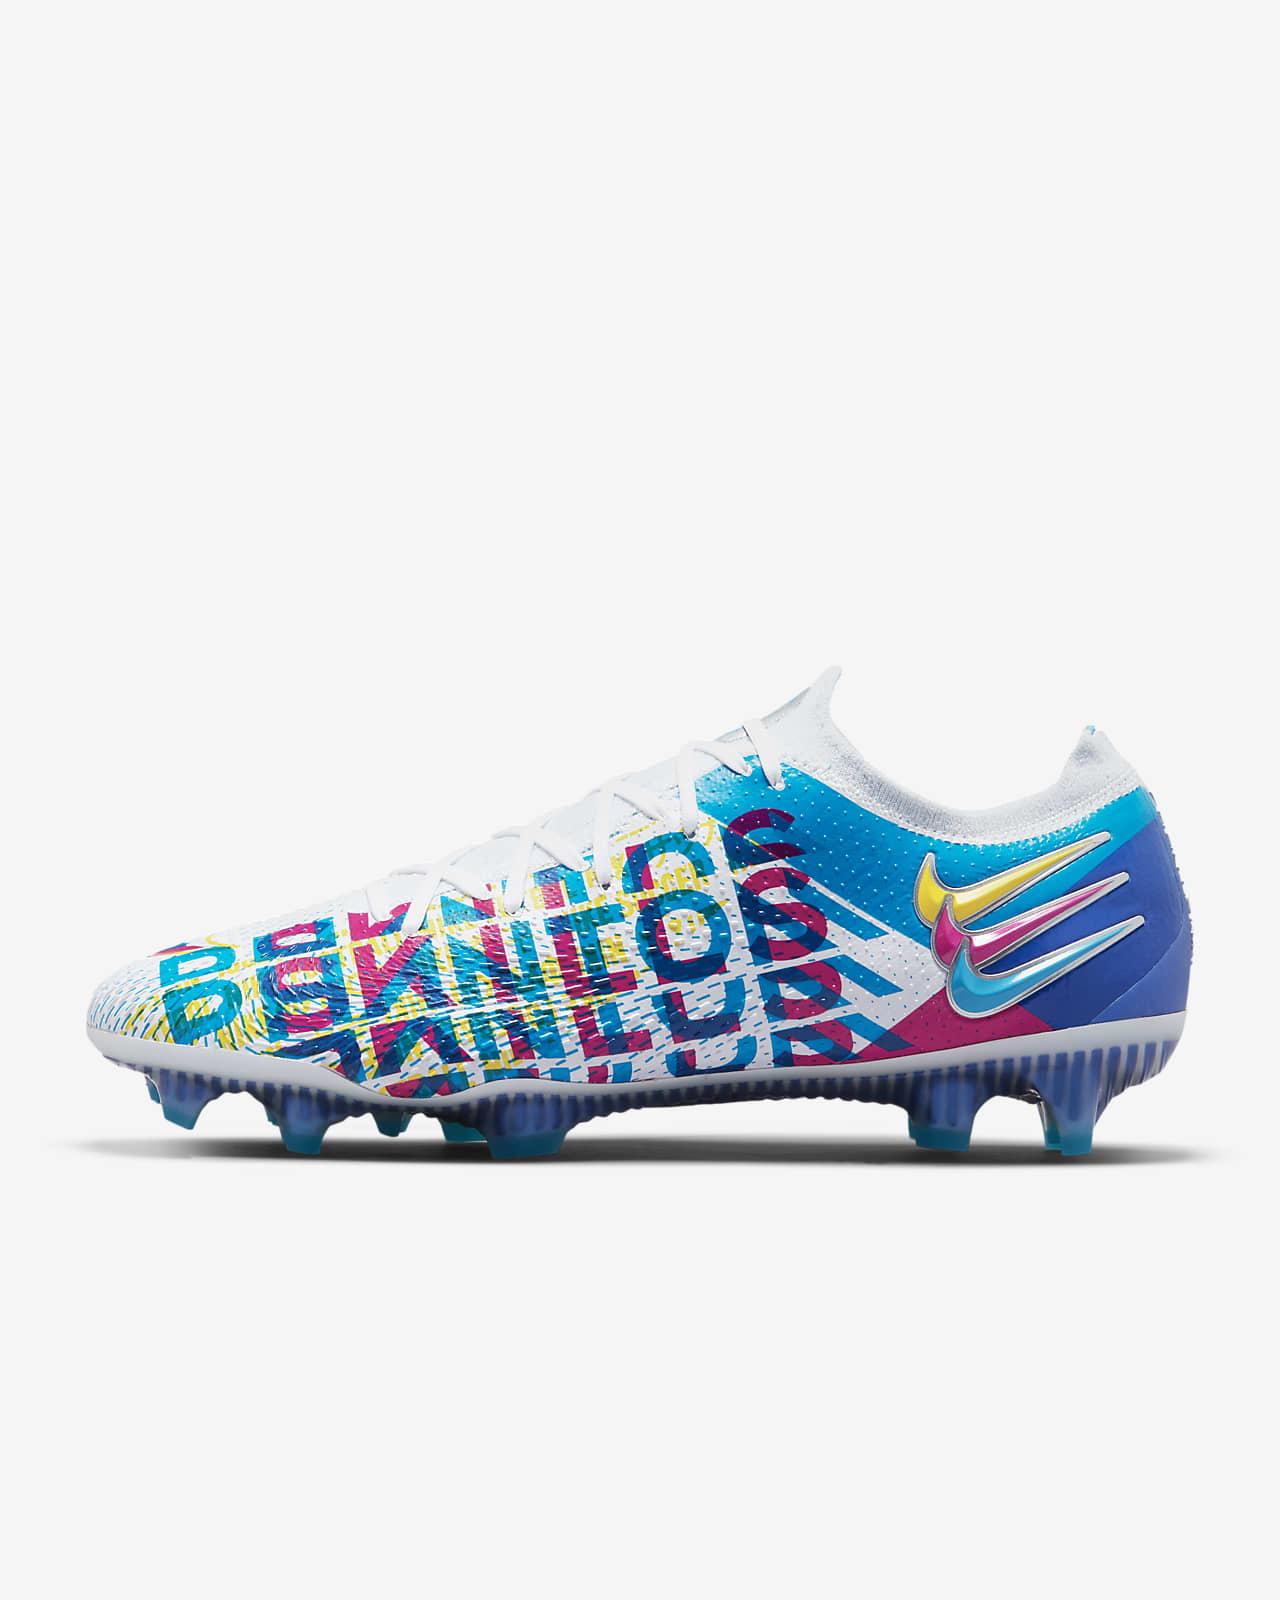 Nike Phantom GT Elite 3D FG Firm-Ground Football Boot